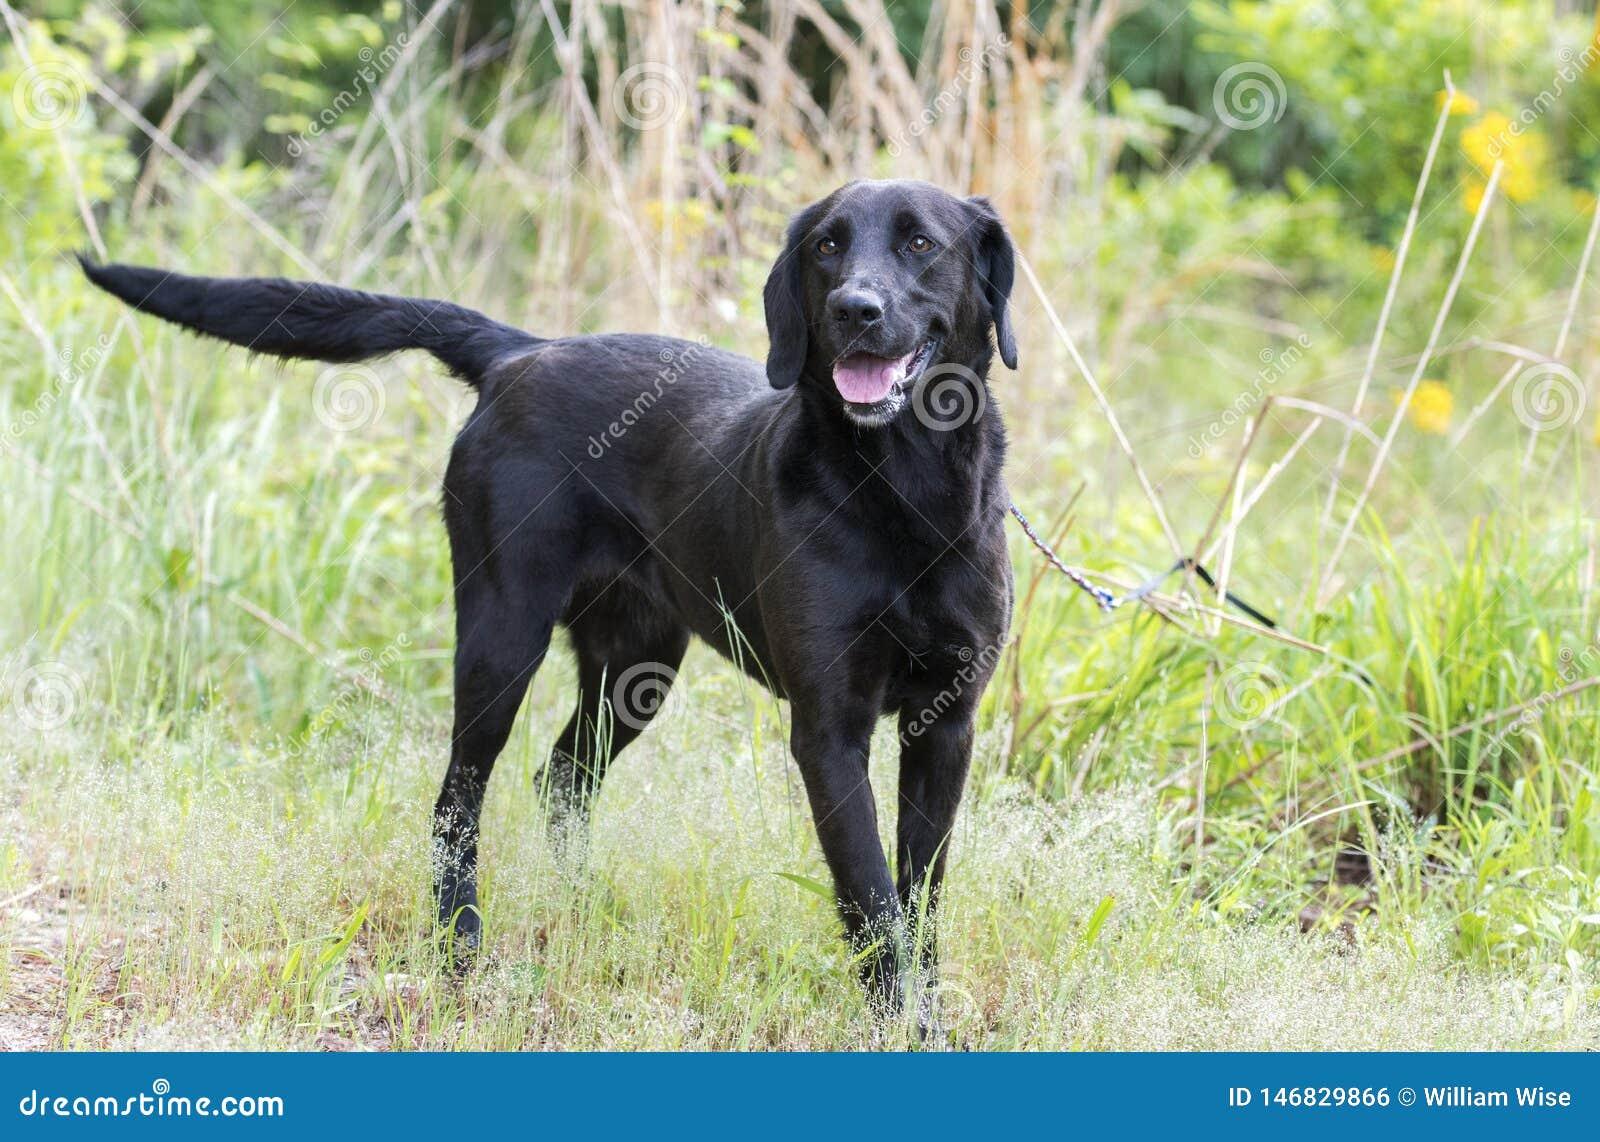 Black Labrador Retriever Dog Outside On Leash Wagging Tail